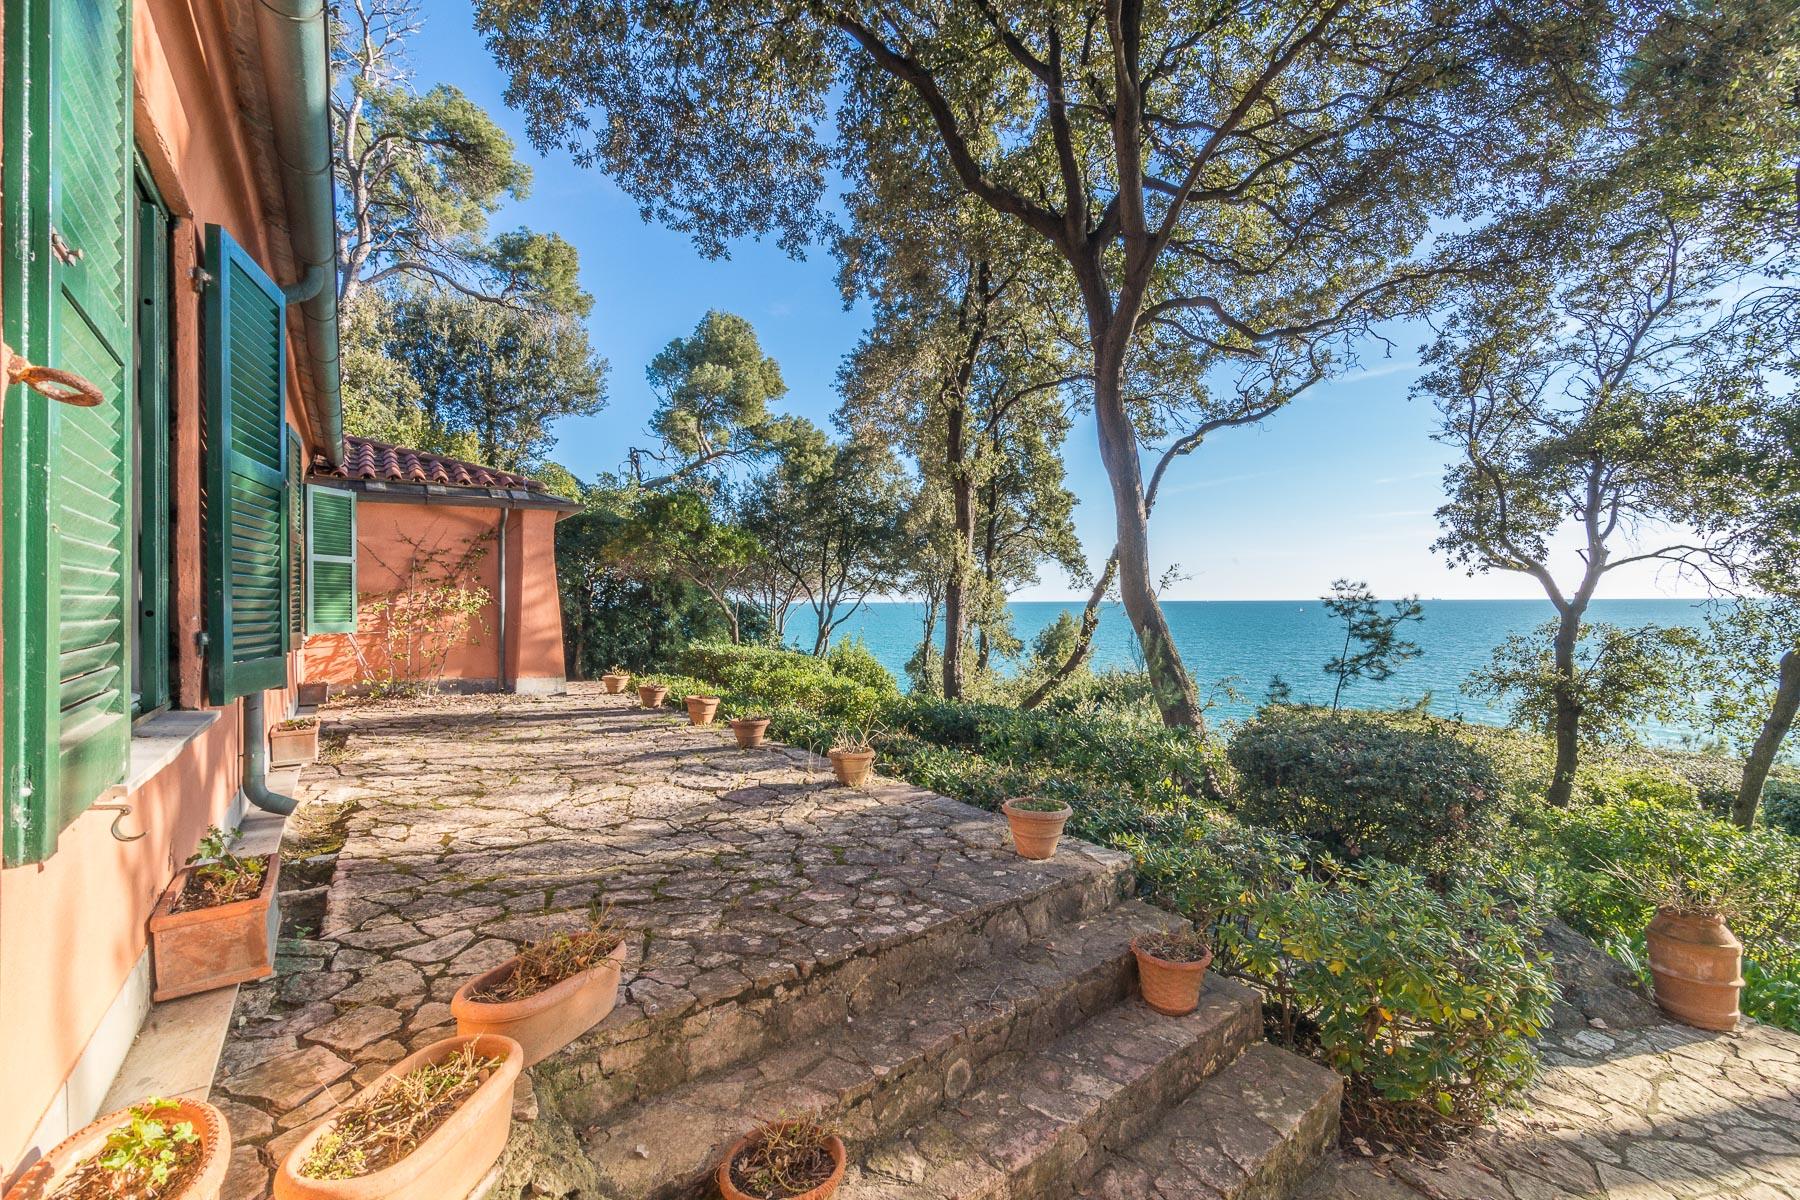 Villa in Vendita a Lerici: 5 locali, 330 mq - Foto 6